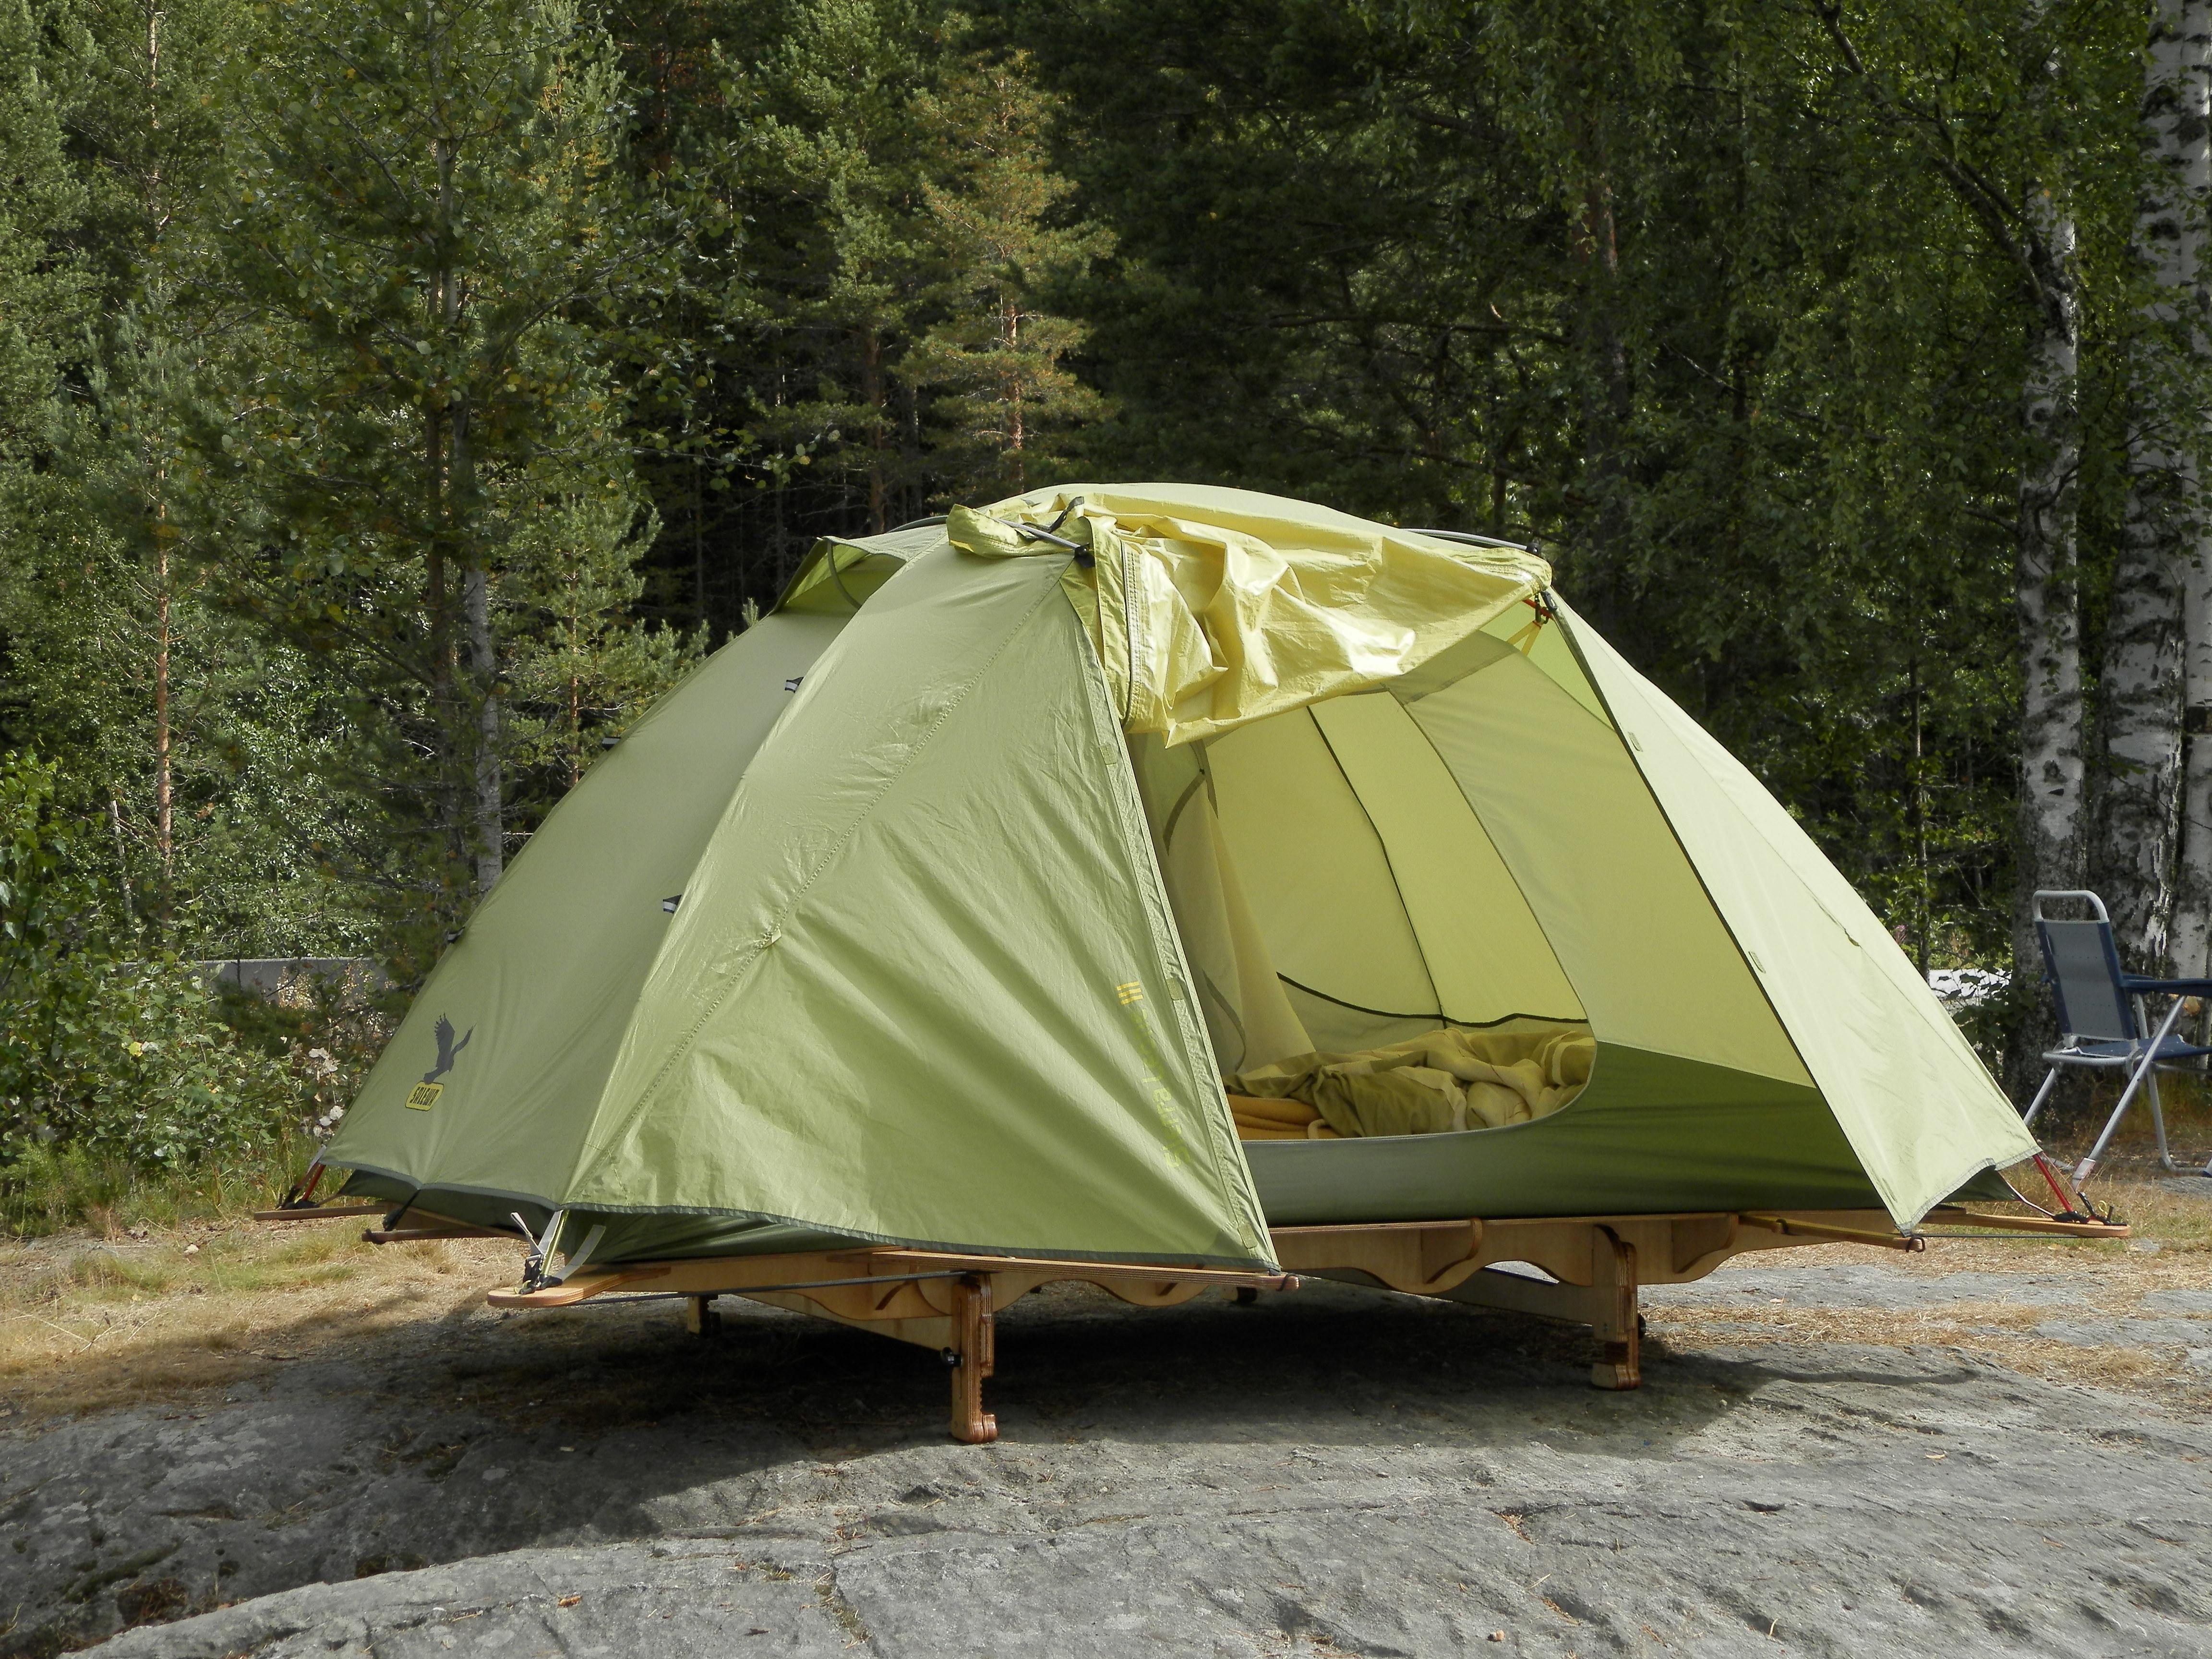 FilePortable Tent Platform B14.JPG & File:Portable Tent Platform B14.JPG - Wikimedia Commons